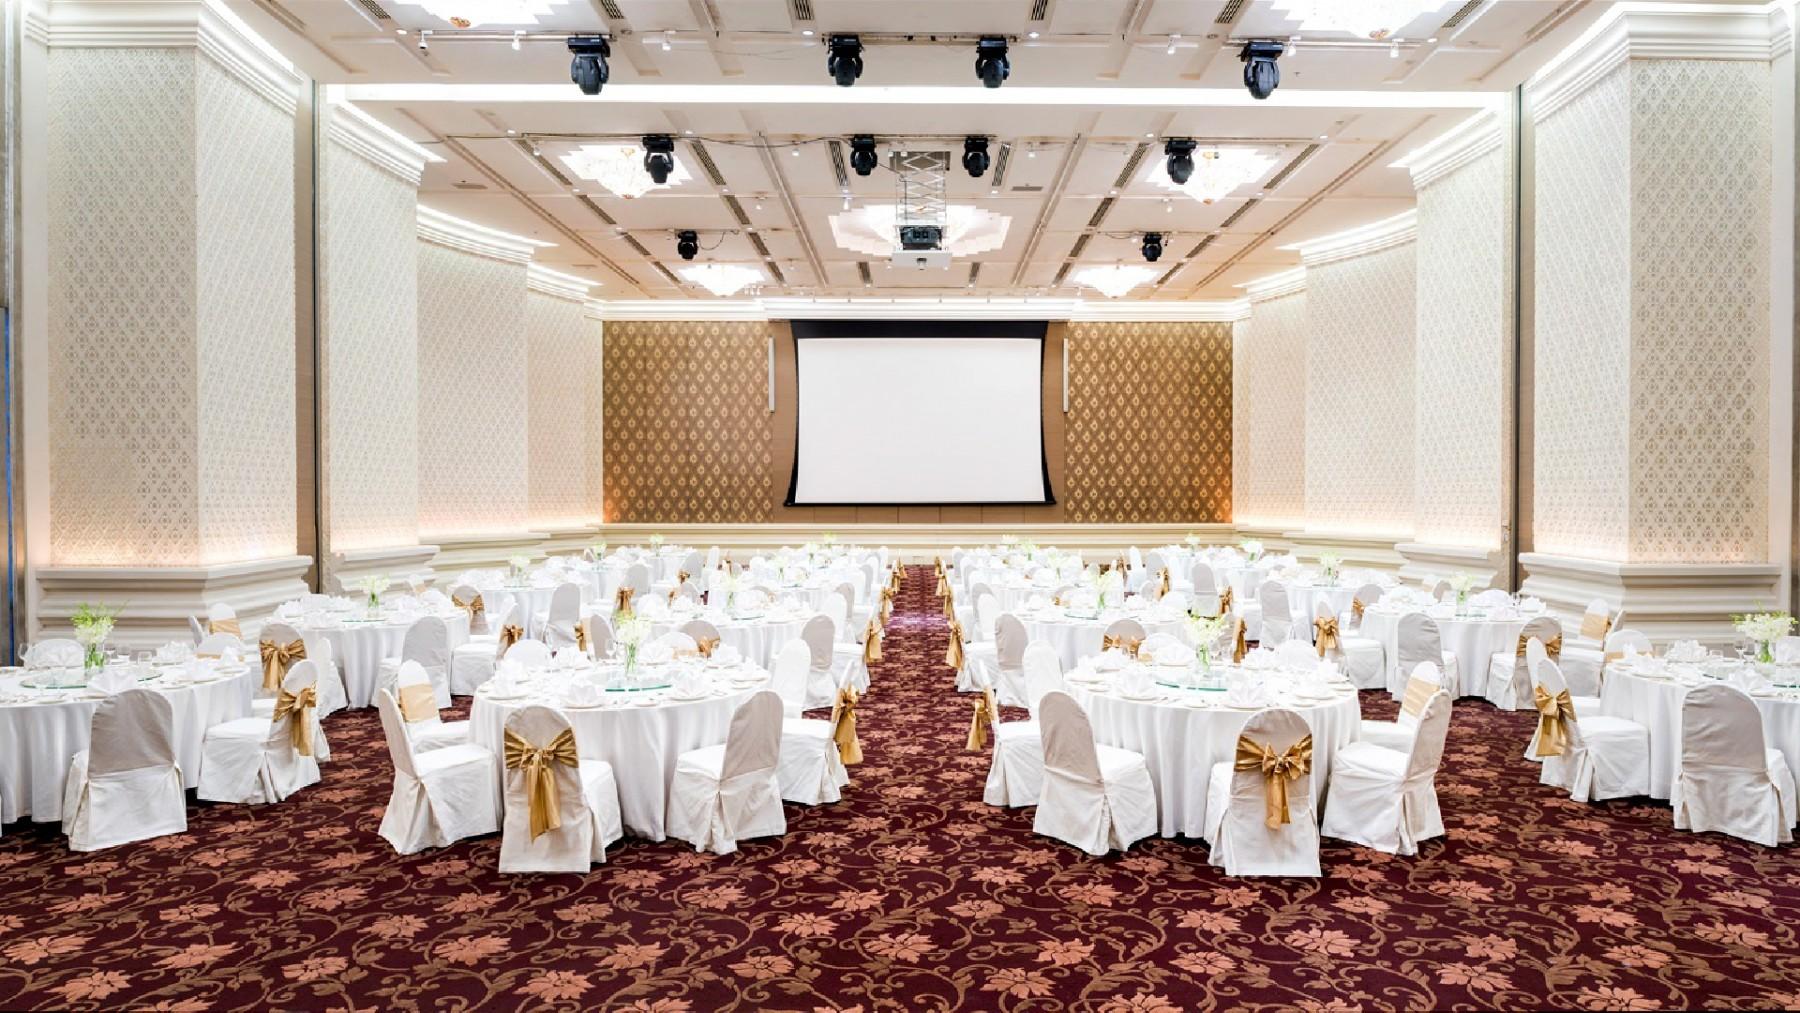 Bangkok Hotel Meeting Room | Pullman Bangkok King Power